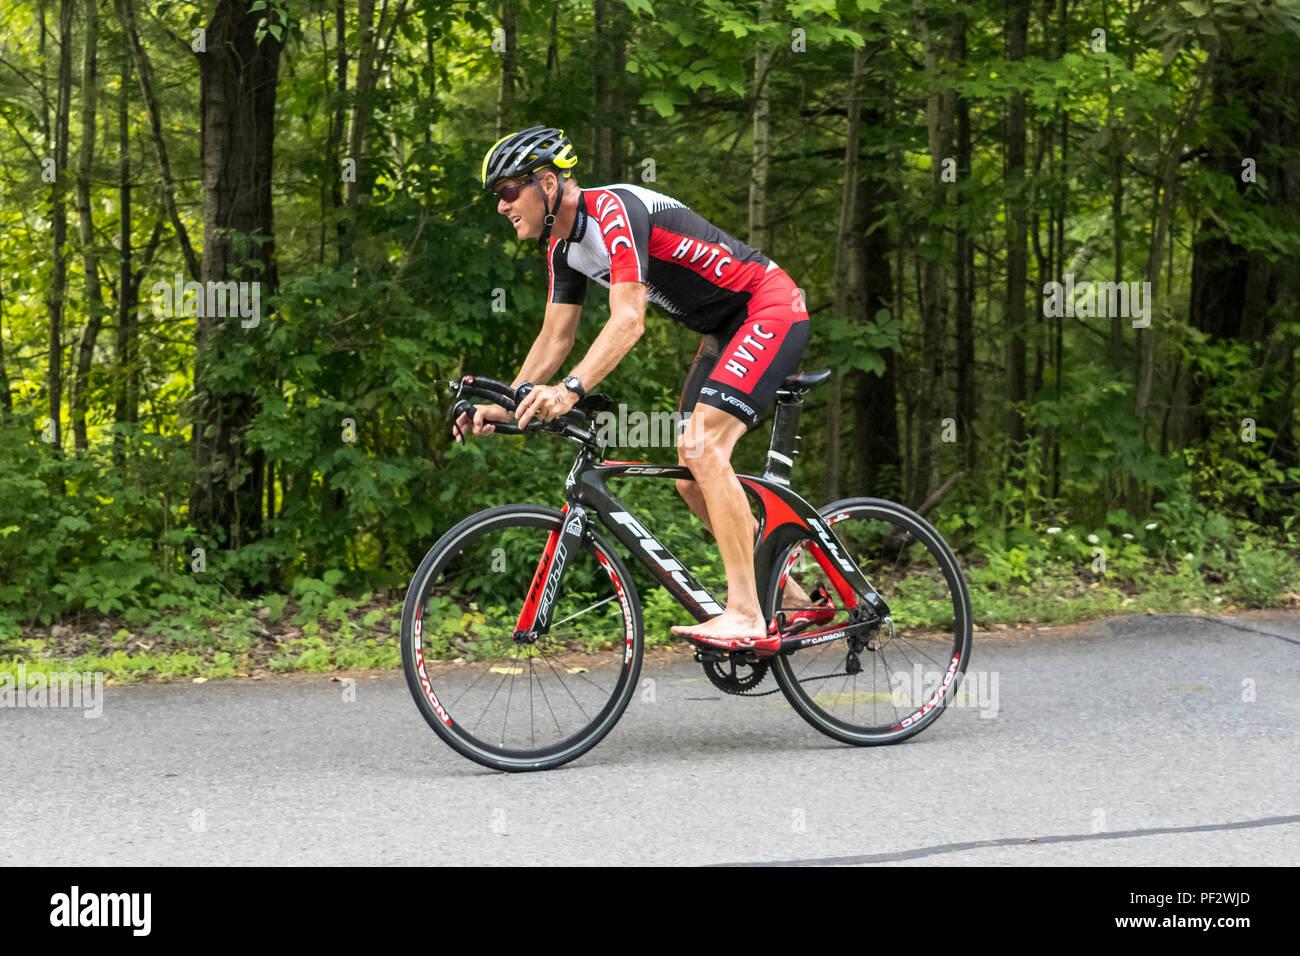 HVTC Summer Tri Series Race #3 - Stock Image